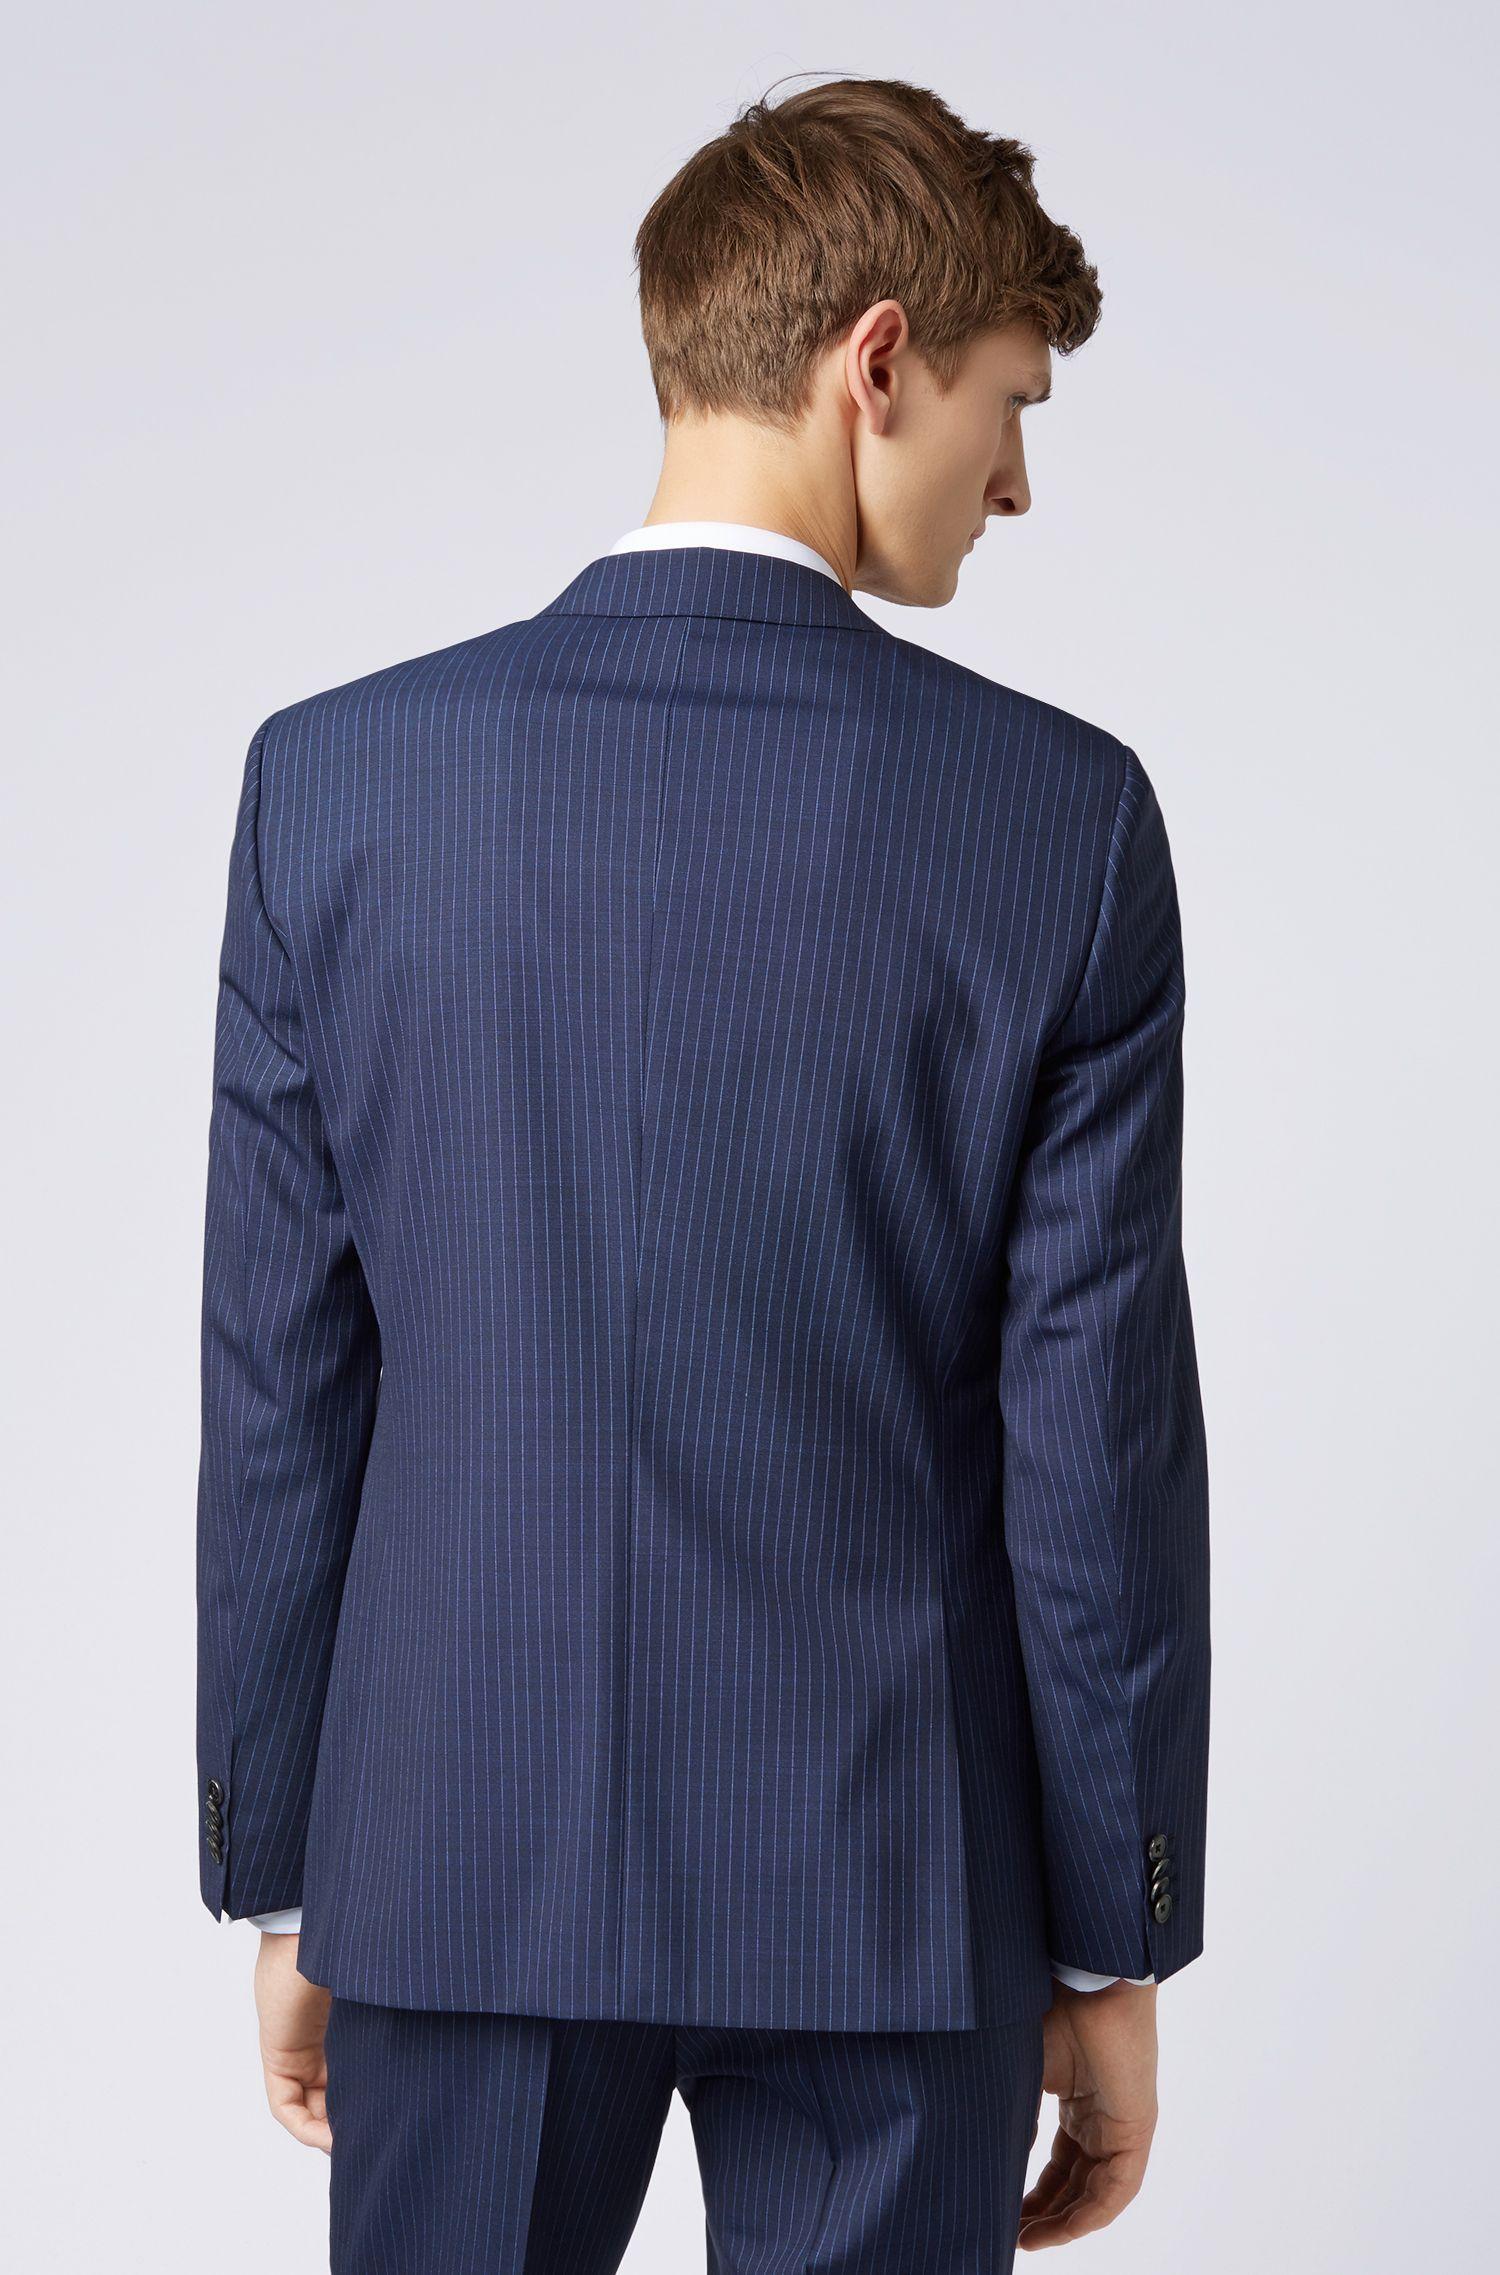 Abito gessato slim fit in lana vergine tropicale, Blu scuro